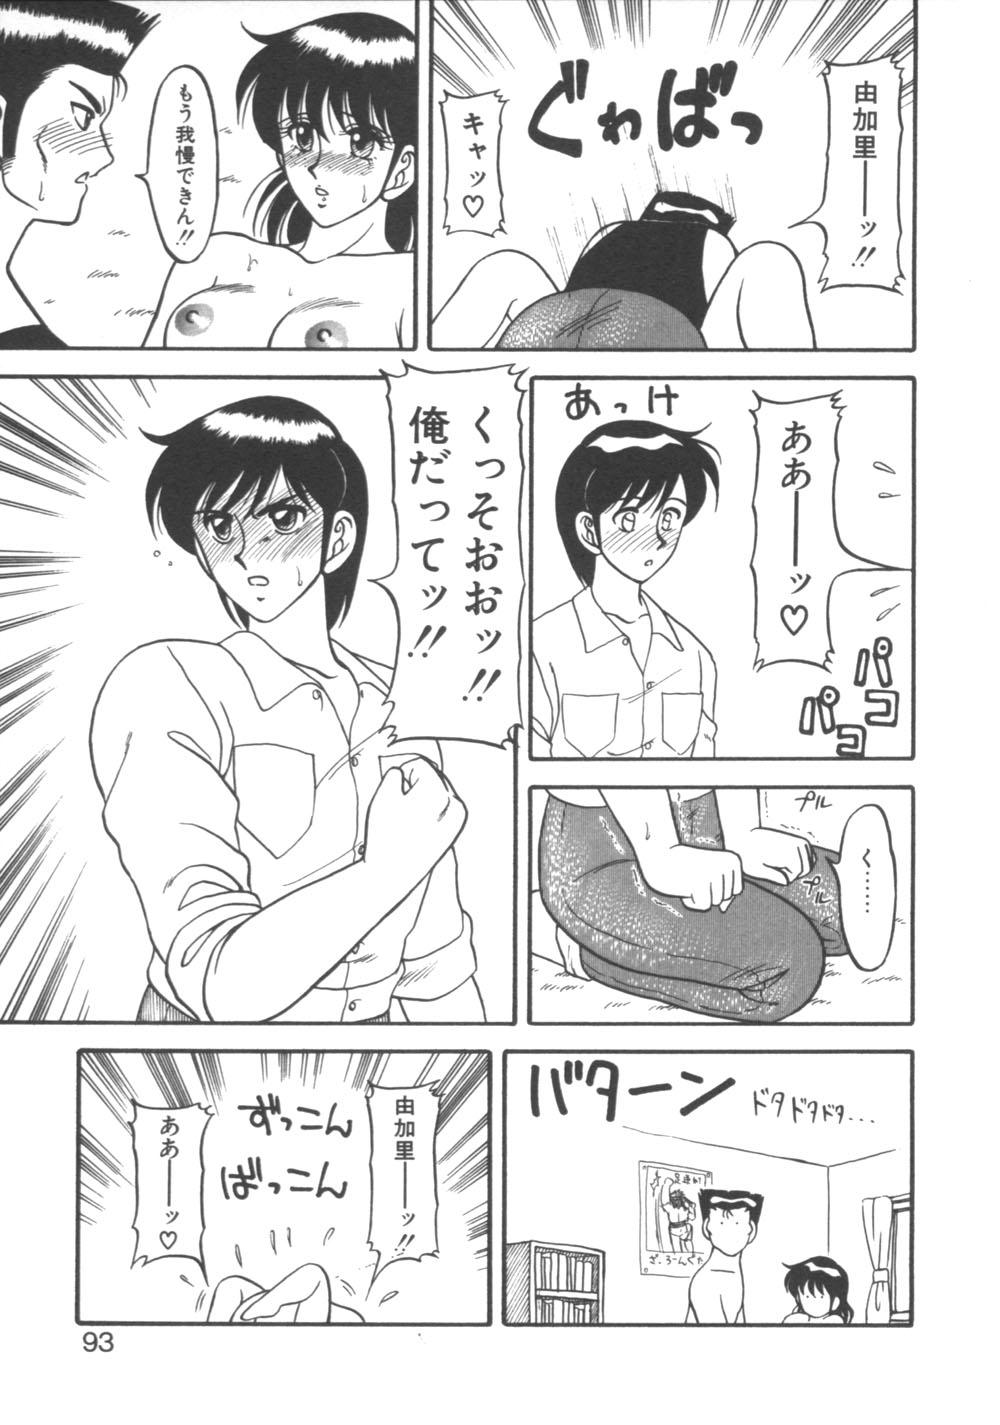 Genki ni Narisou 92